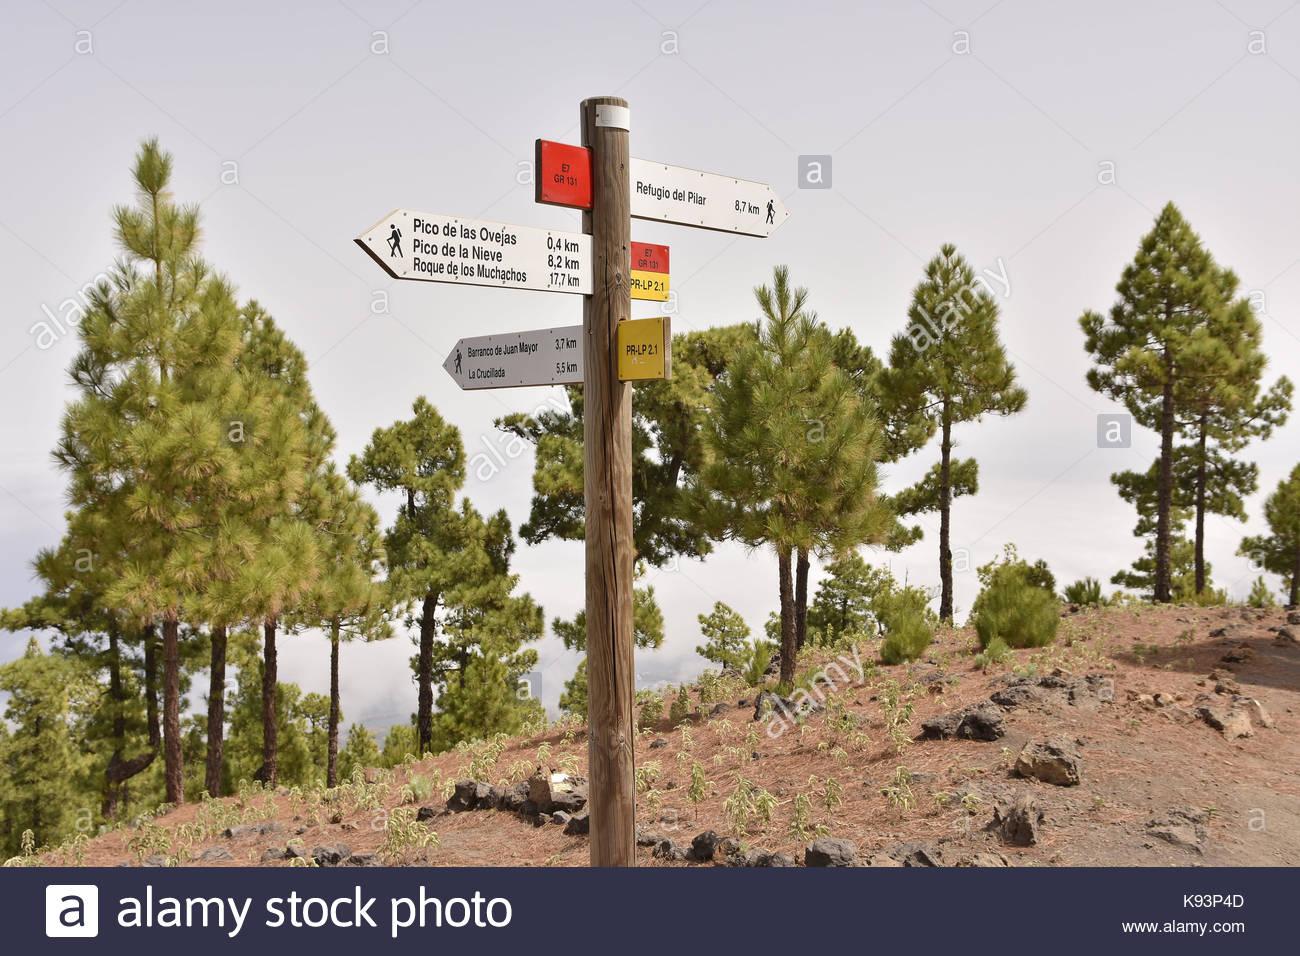 Ruta de la Cresteria hiking path direction signs, Caldera de Taburiente National Park La Palma Canary Islands. - Stock Image